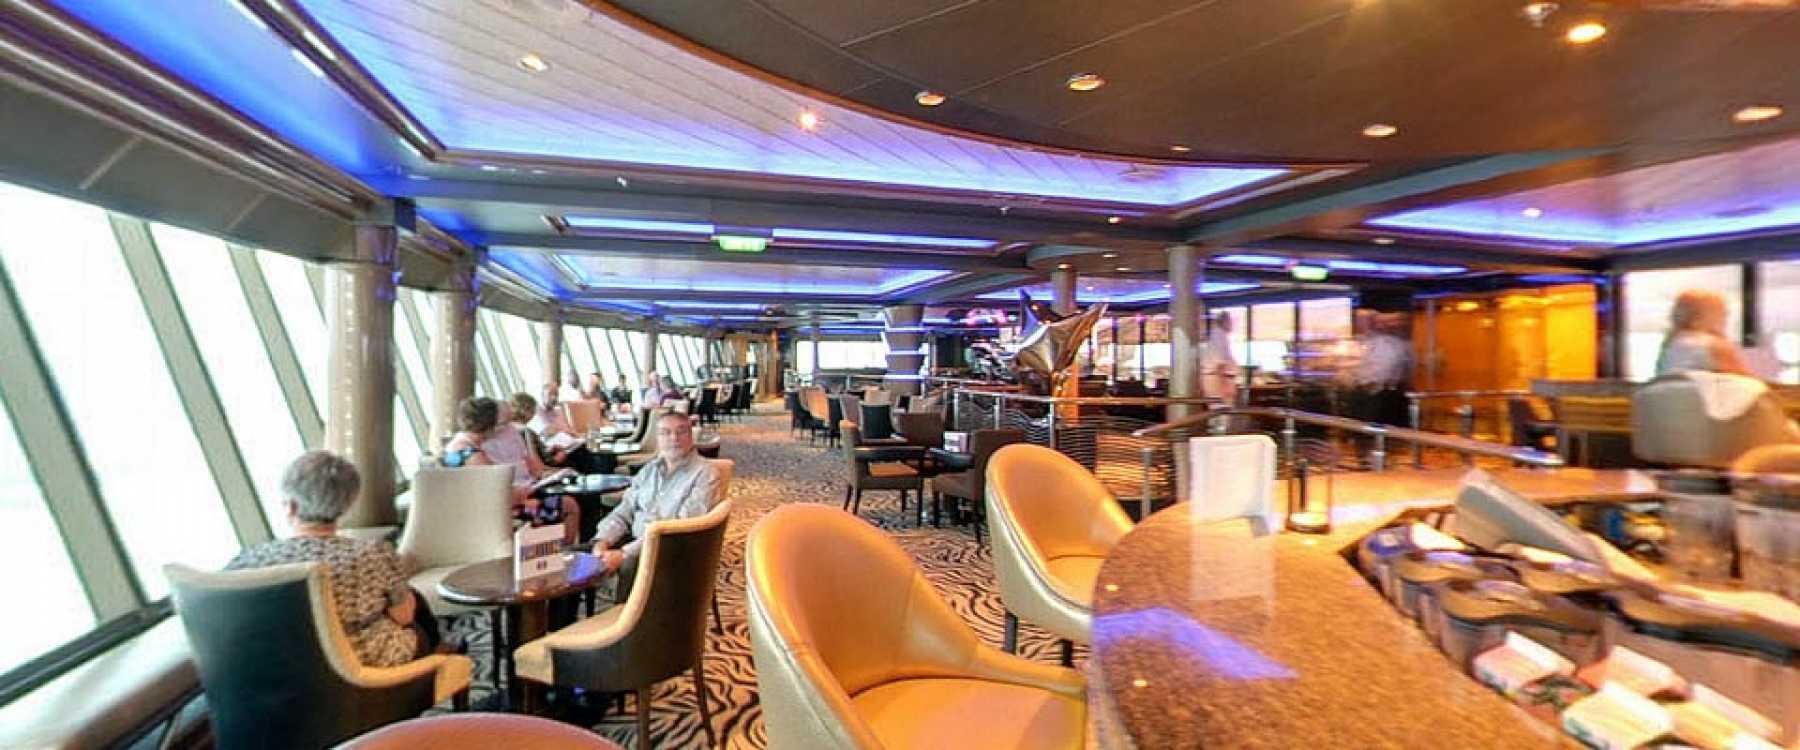 P&O Cruises Ventura Interior Metropolis 1.jpg